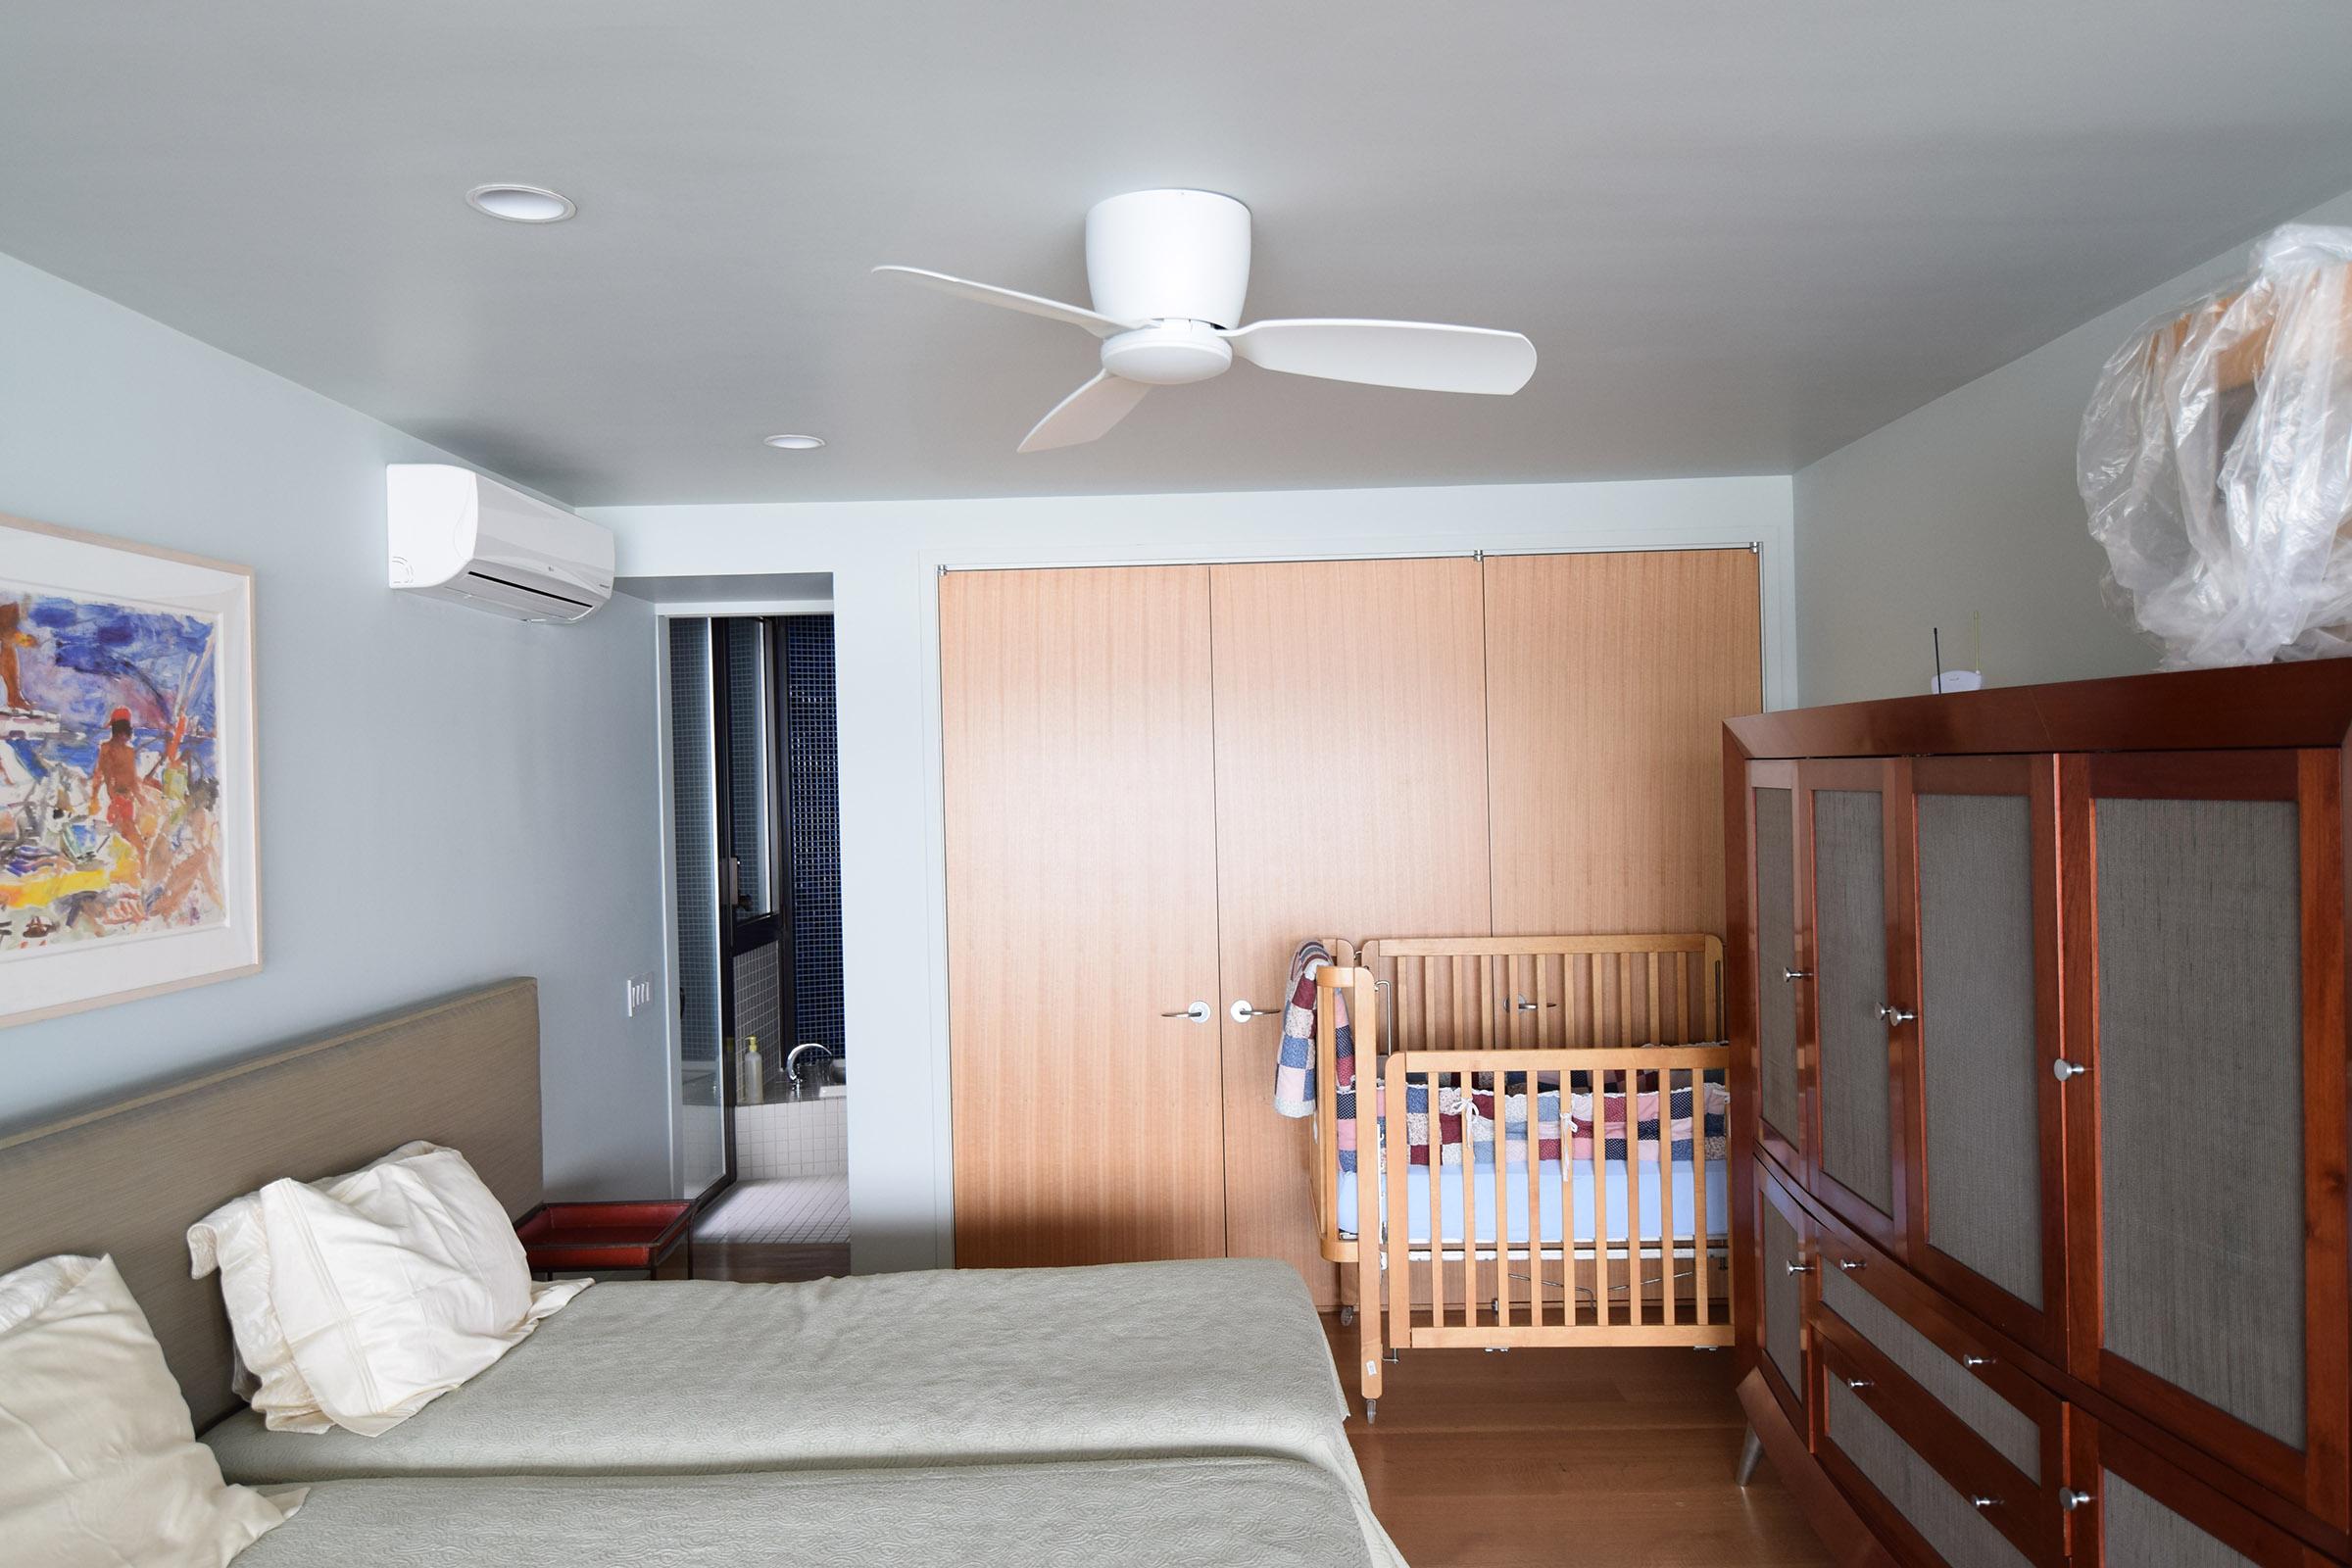 Rift Anigre Custom Bedroom Closet